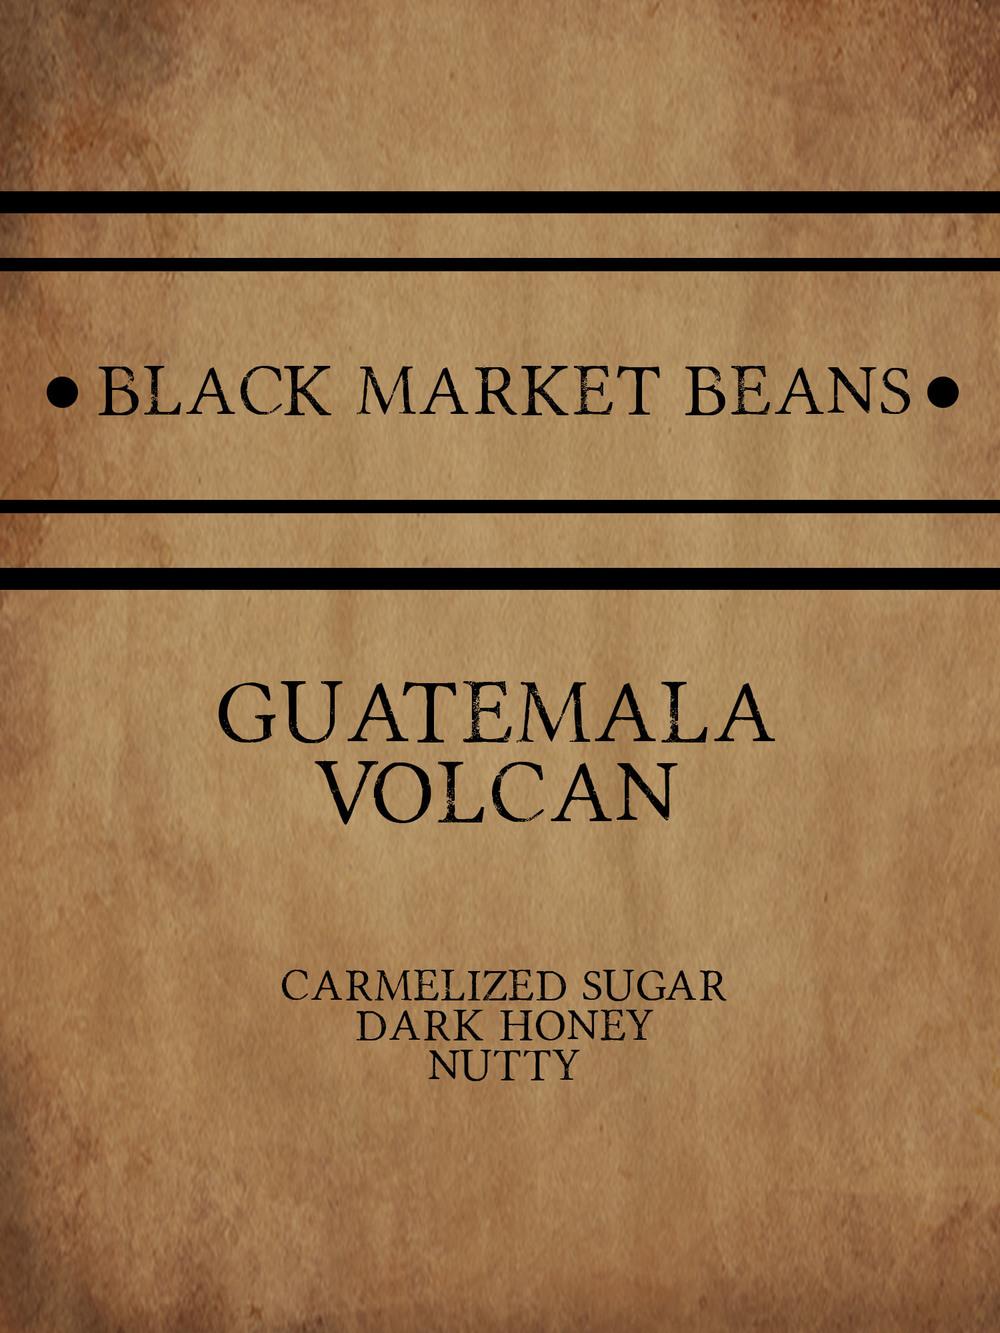 coffee_Guatemala_volcan.jpg